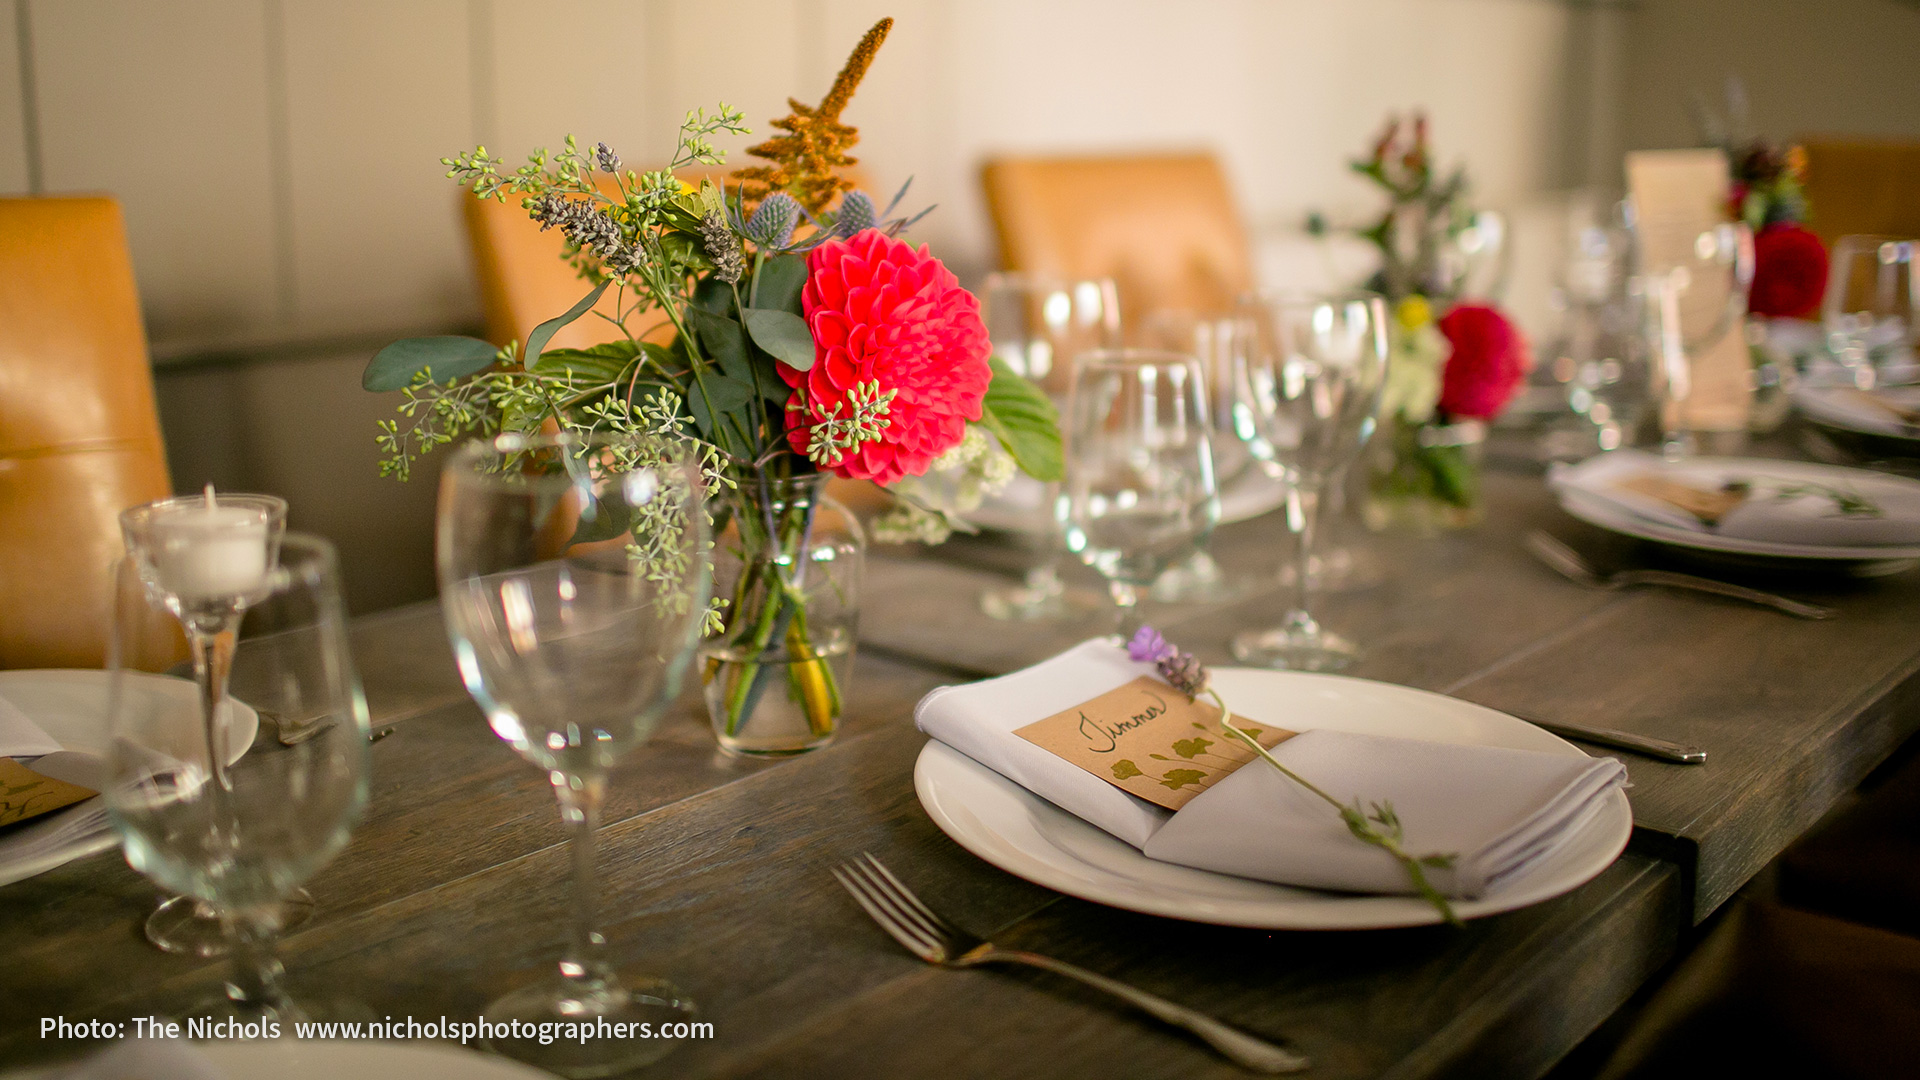 Bear Valley Wedding Venues & Weddings - Bear Valley